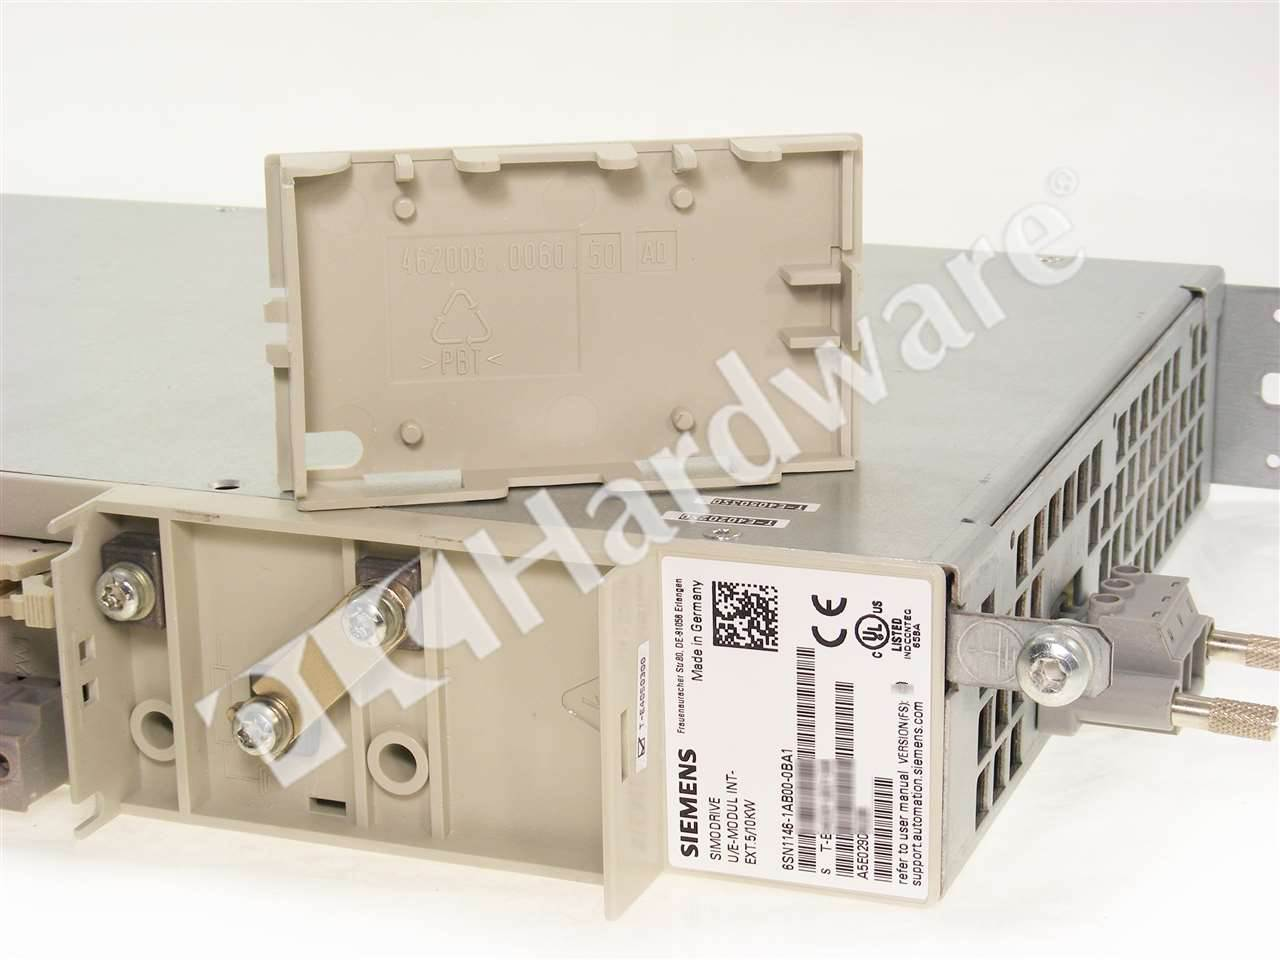 KIT New FS FOR SIEMENS 6SN1123-1AB00-0CA1 SIMODRIVE 611 LT MODULE 100MM